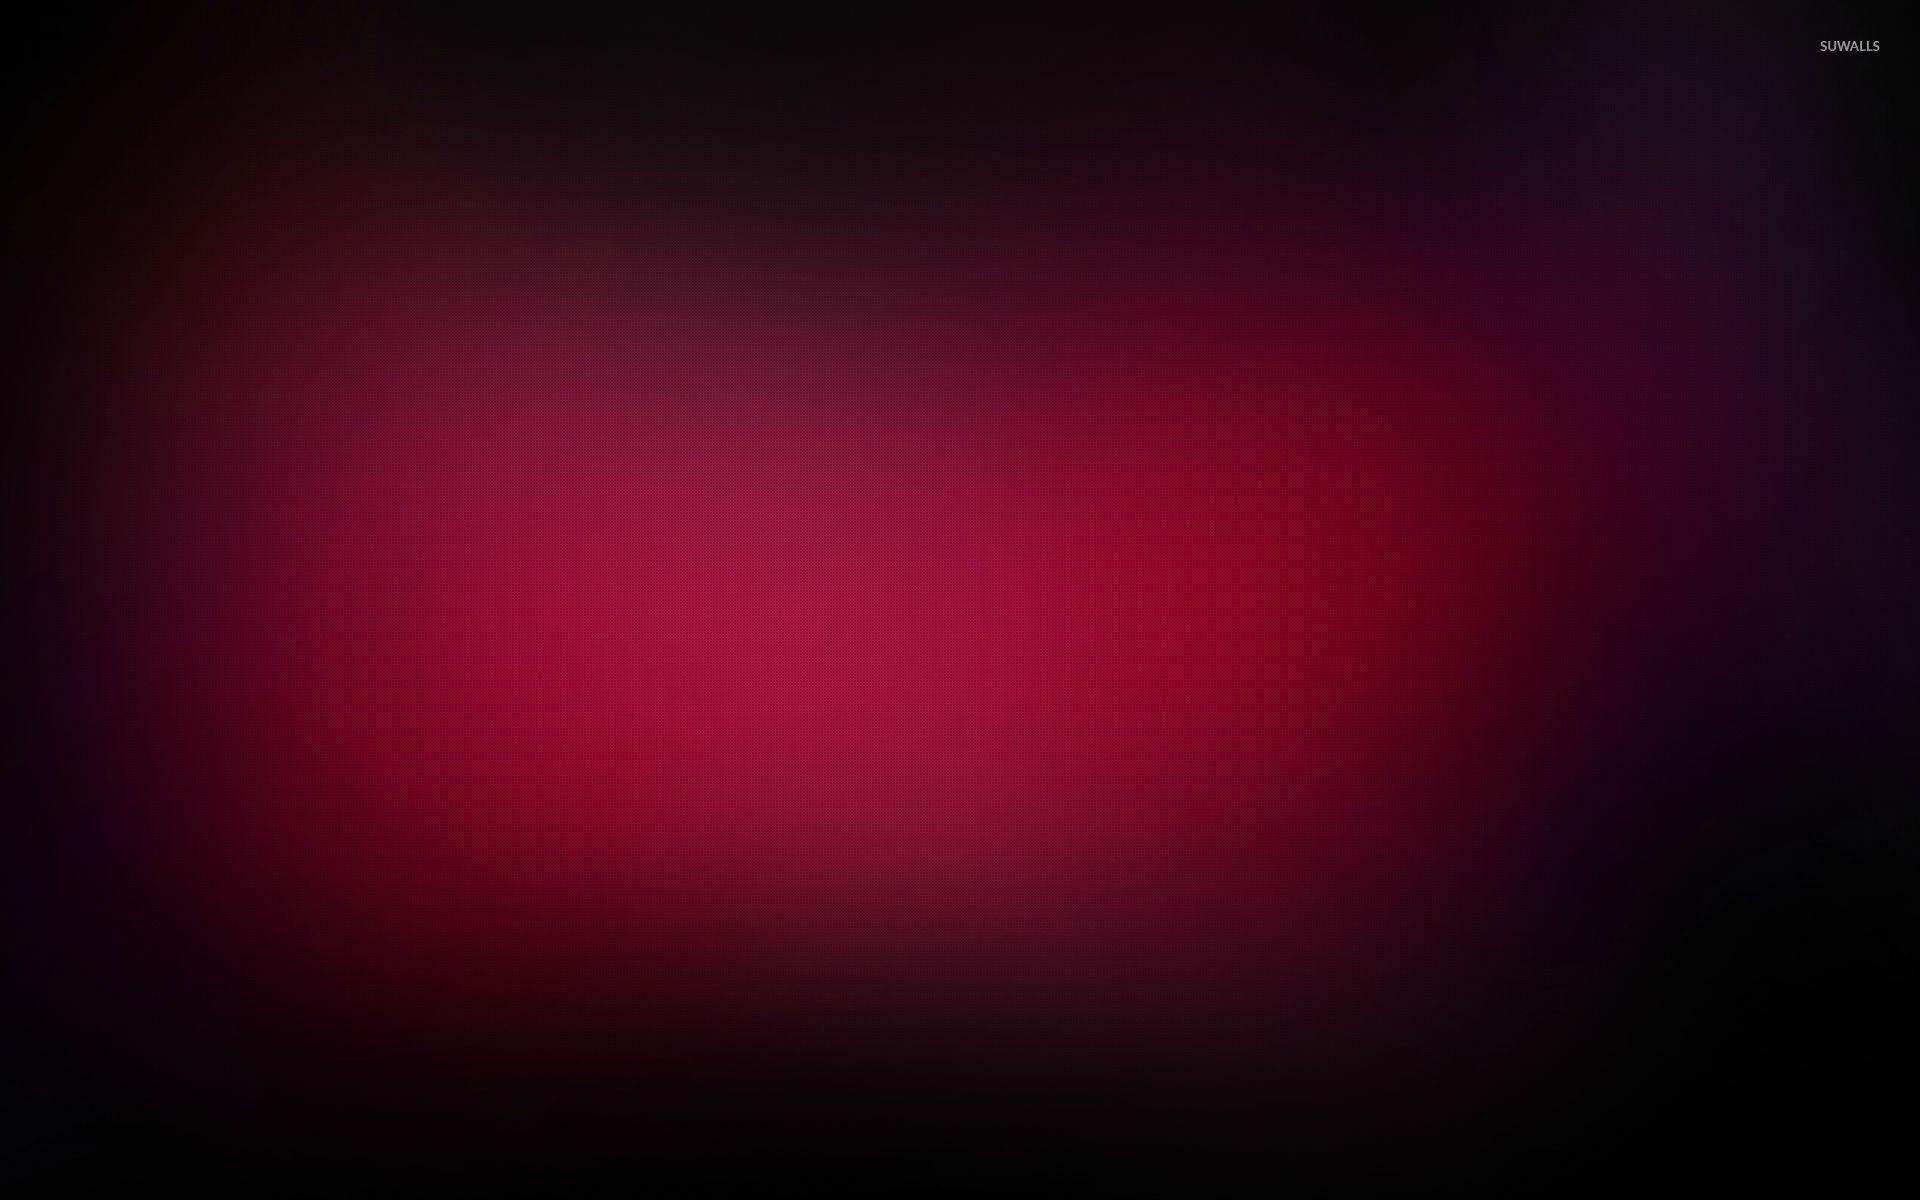 Red Gradient 2 Wallpaper